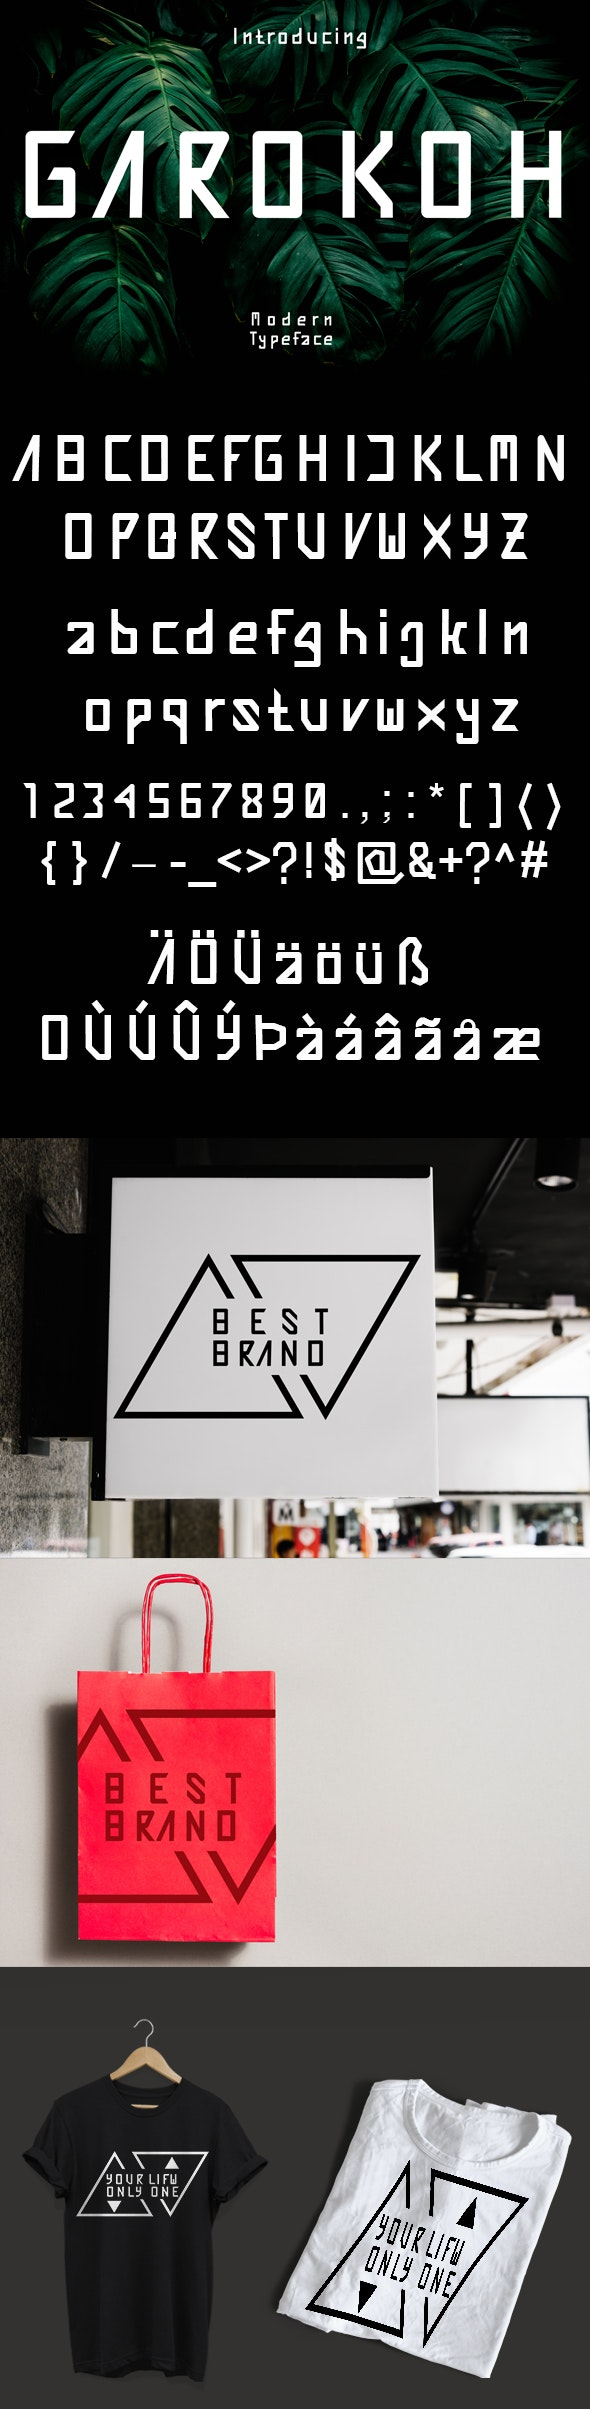 GAROKOH - Cool Fonts